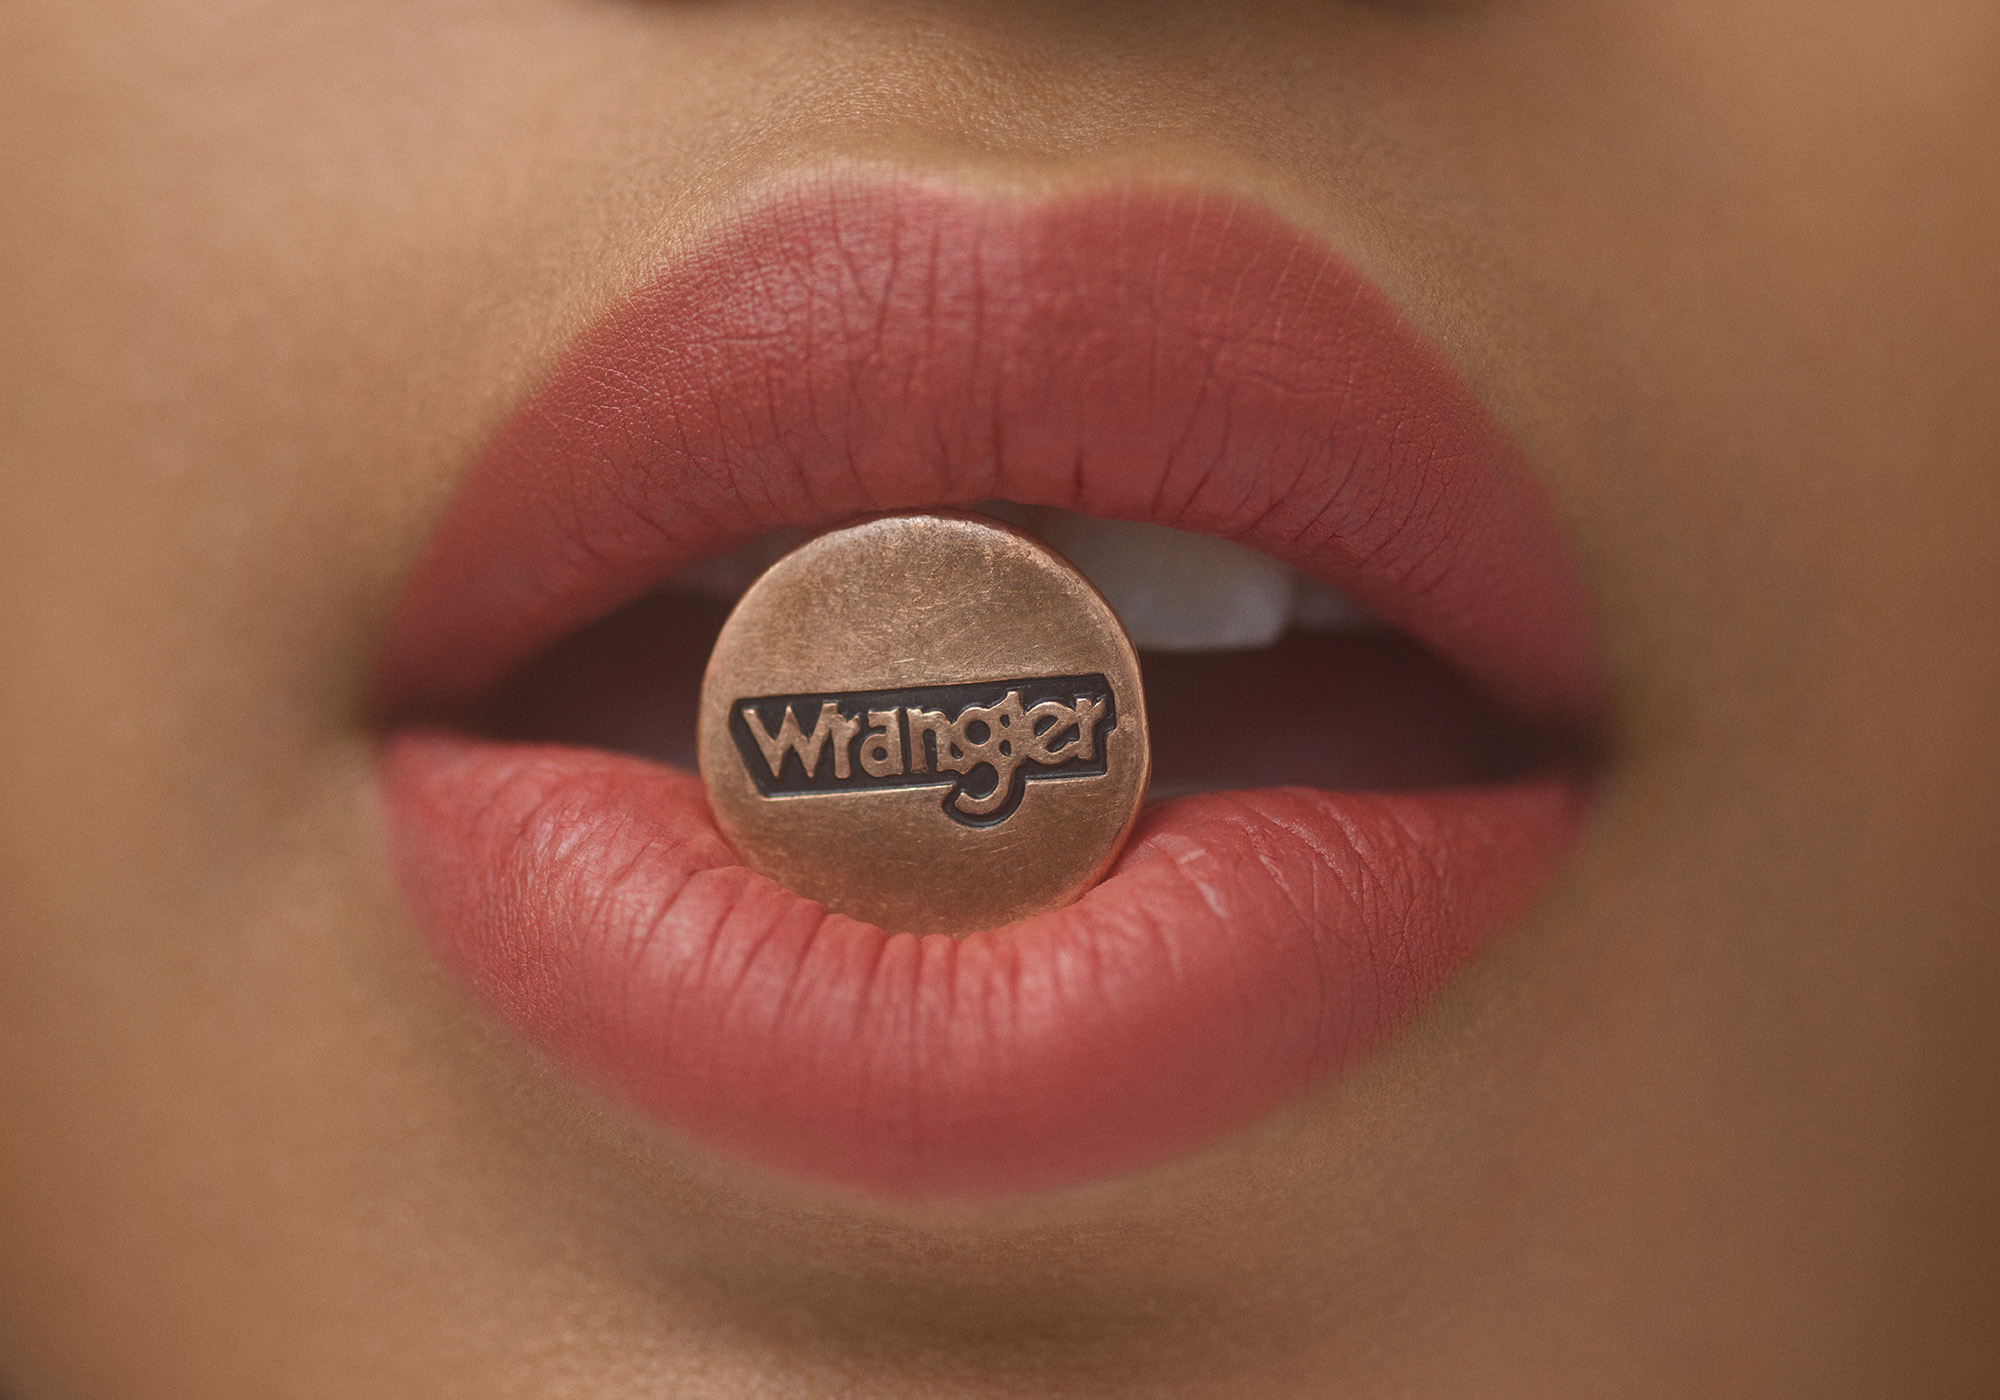 Wrangler | Photographer Markus Pritzi